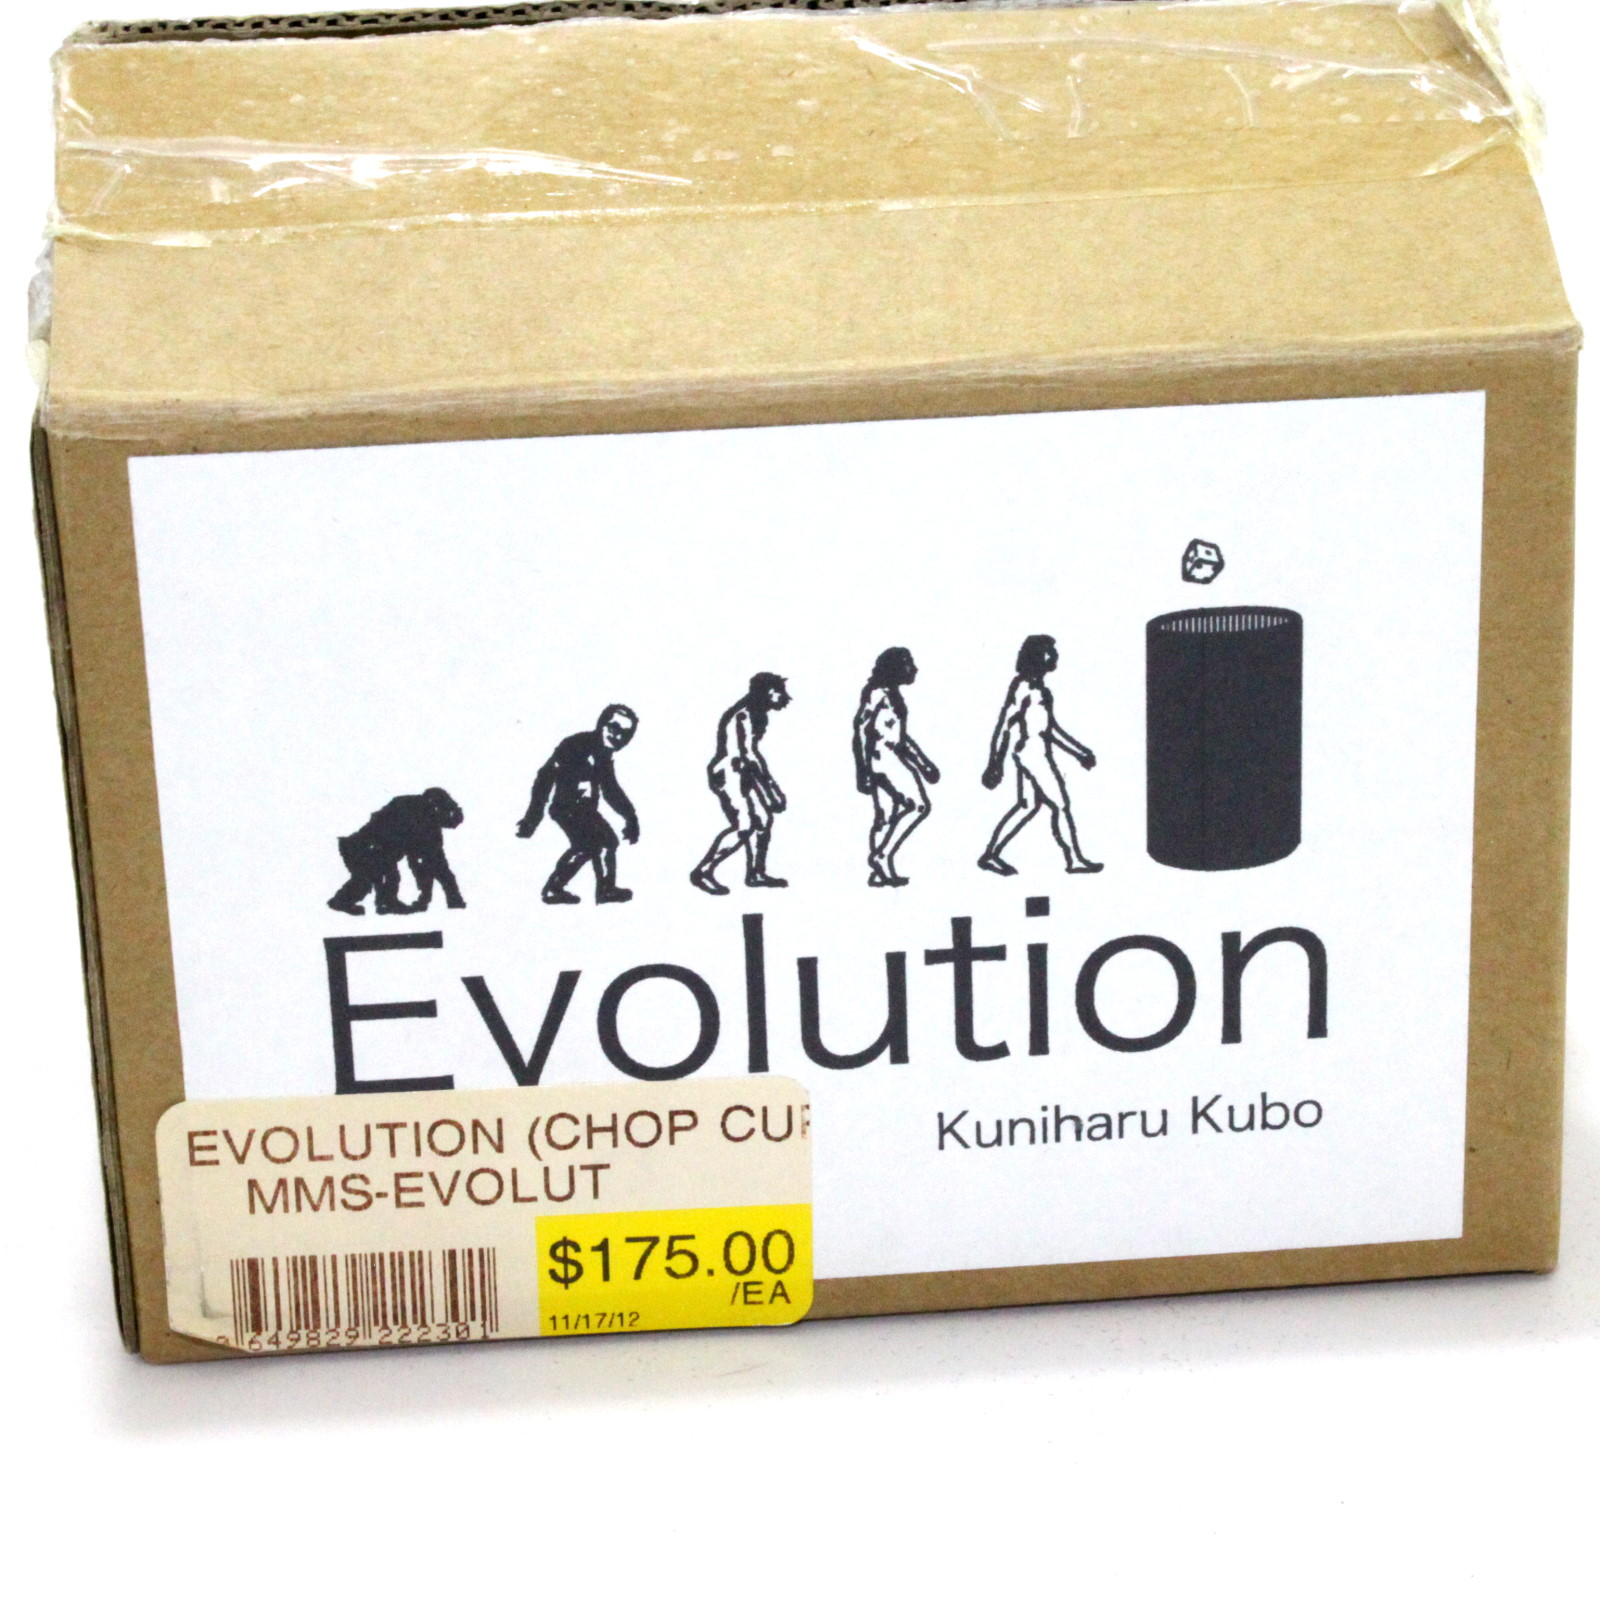 Evolution (Chop Cup) by Kuniharu Kubo